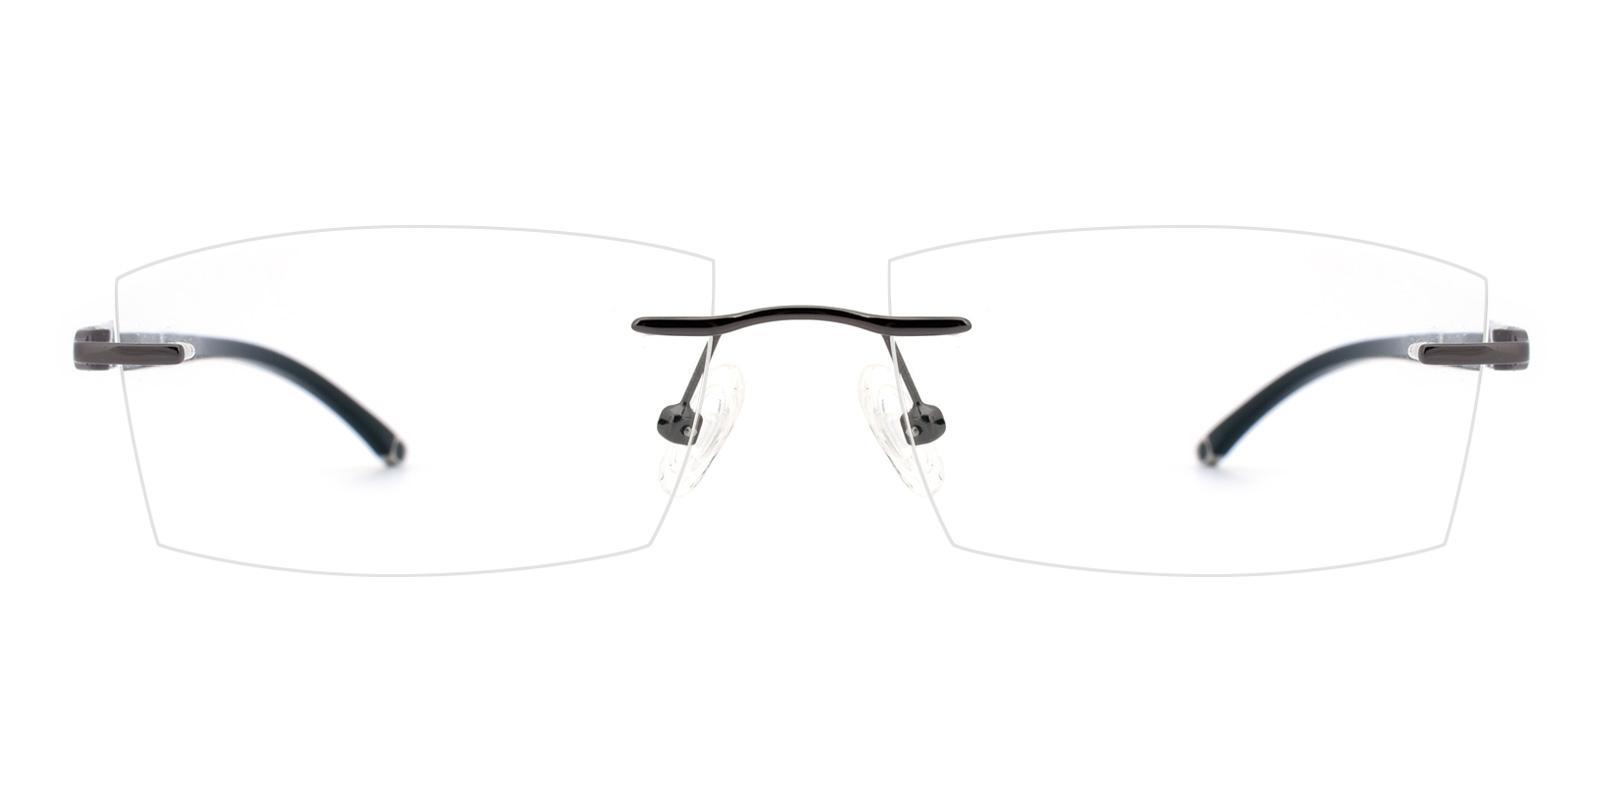 Doumbia-Black-Varieties-Titanium-Eyeglasses-additional2